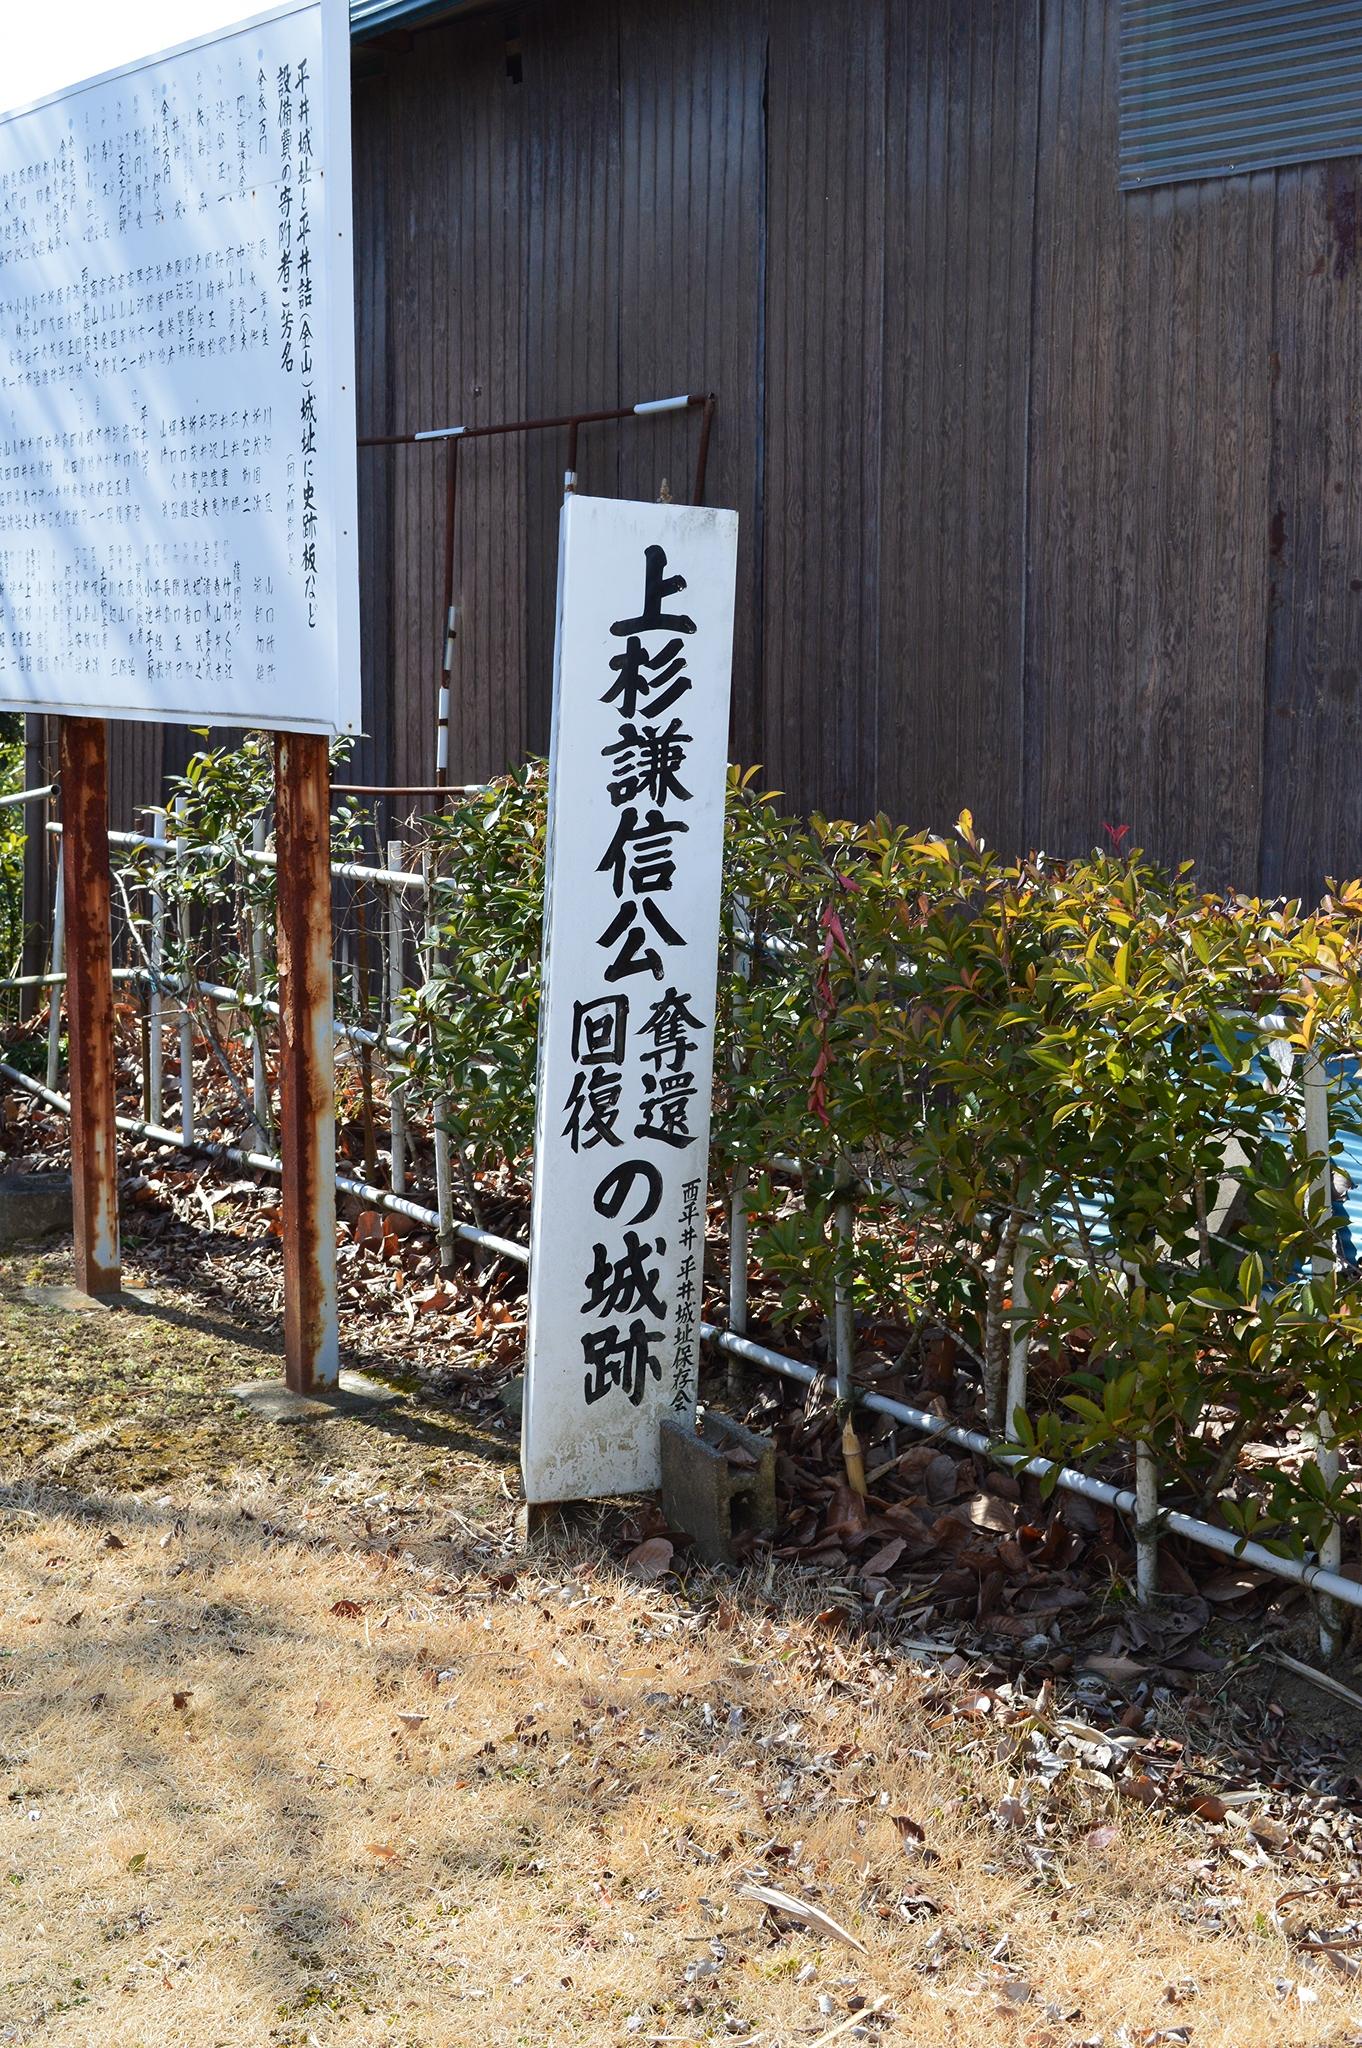 w300h300MOQAWH5H平井城